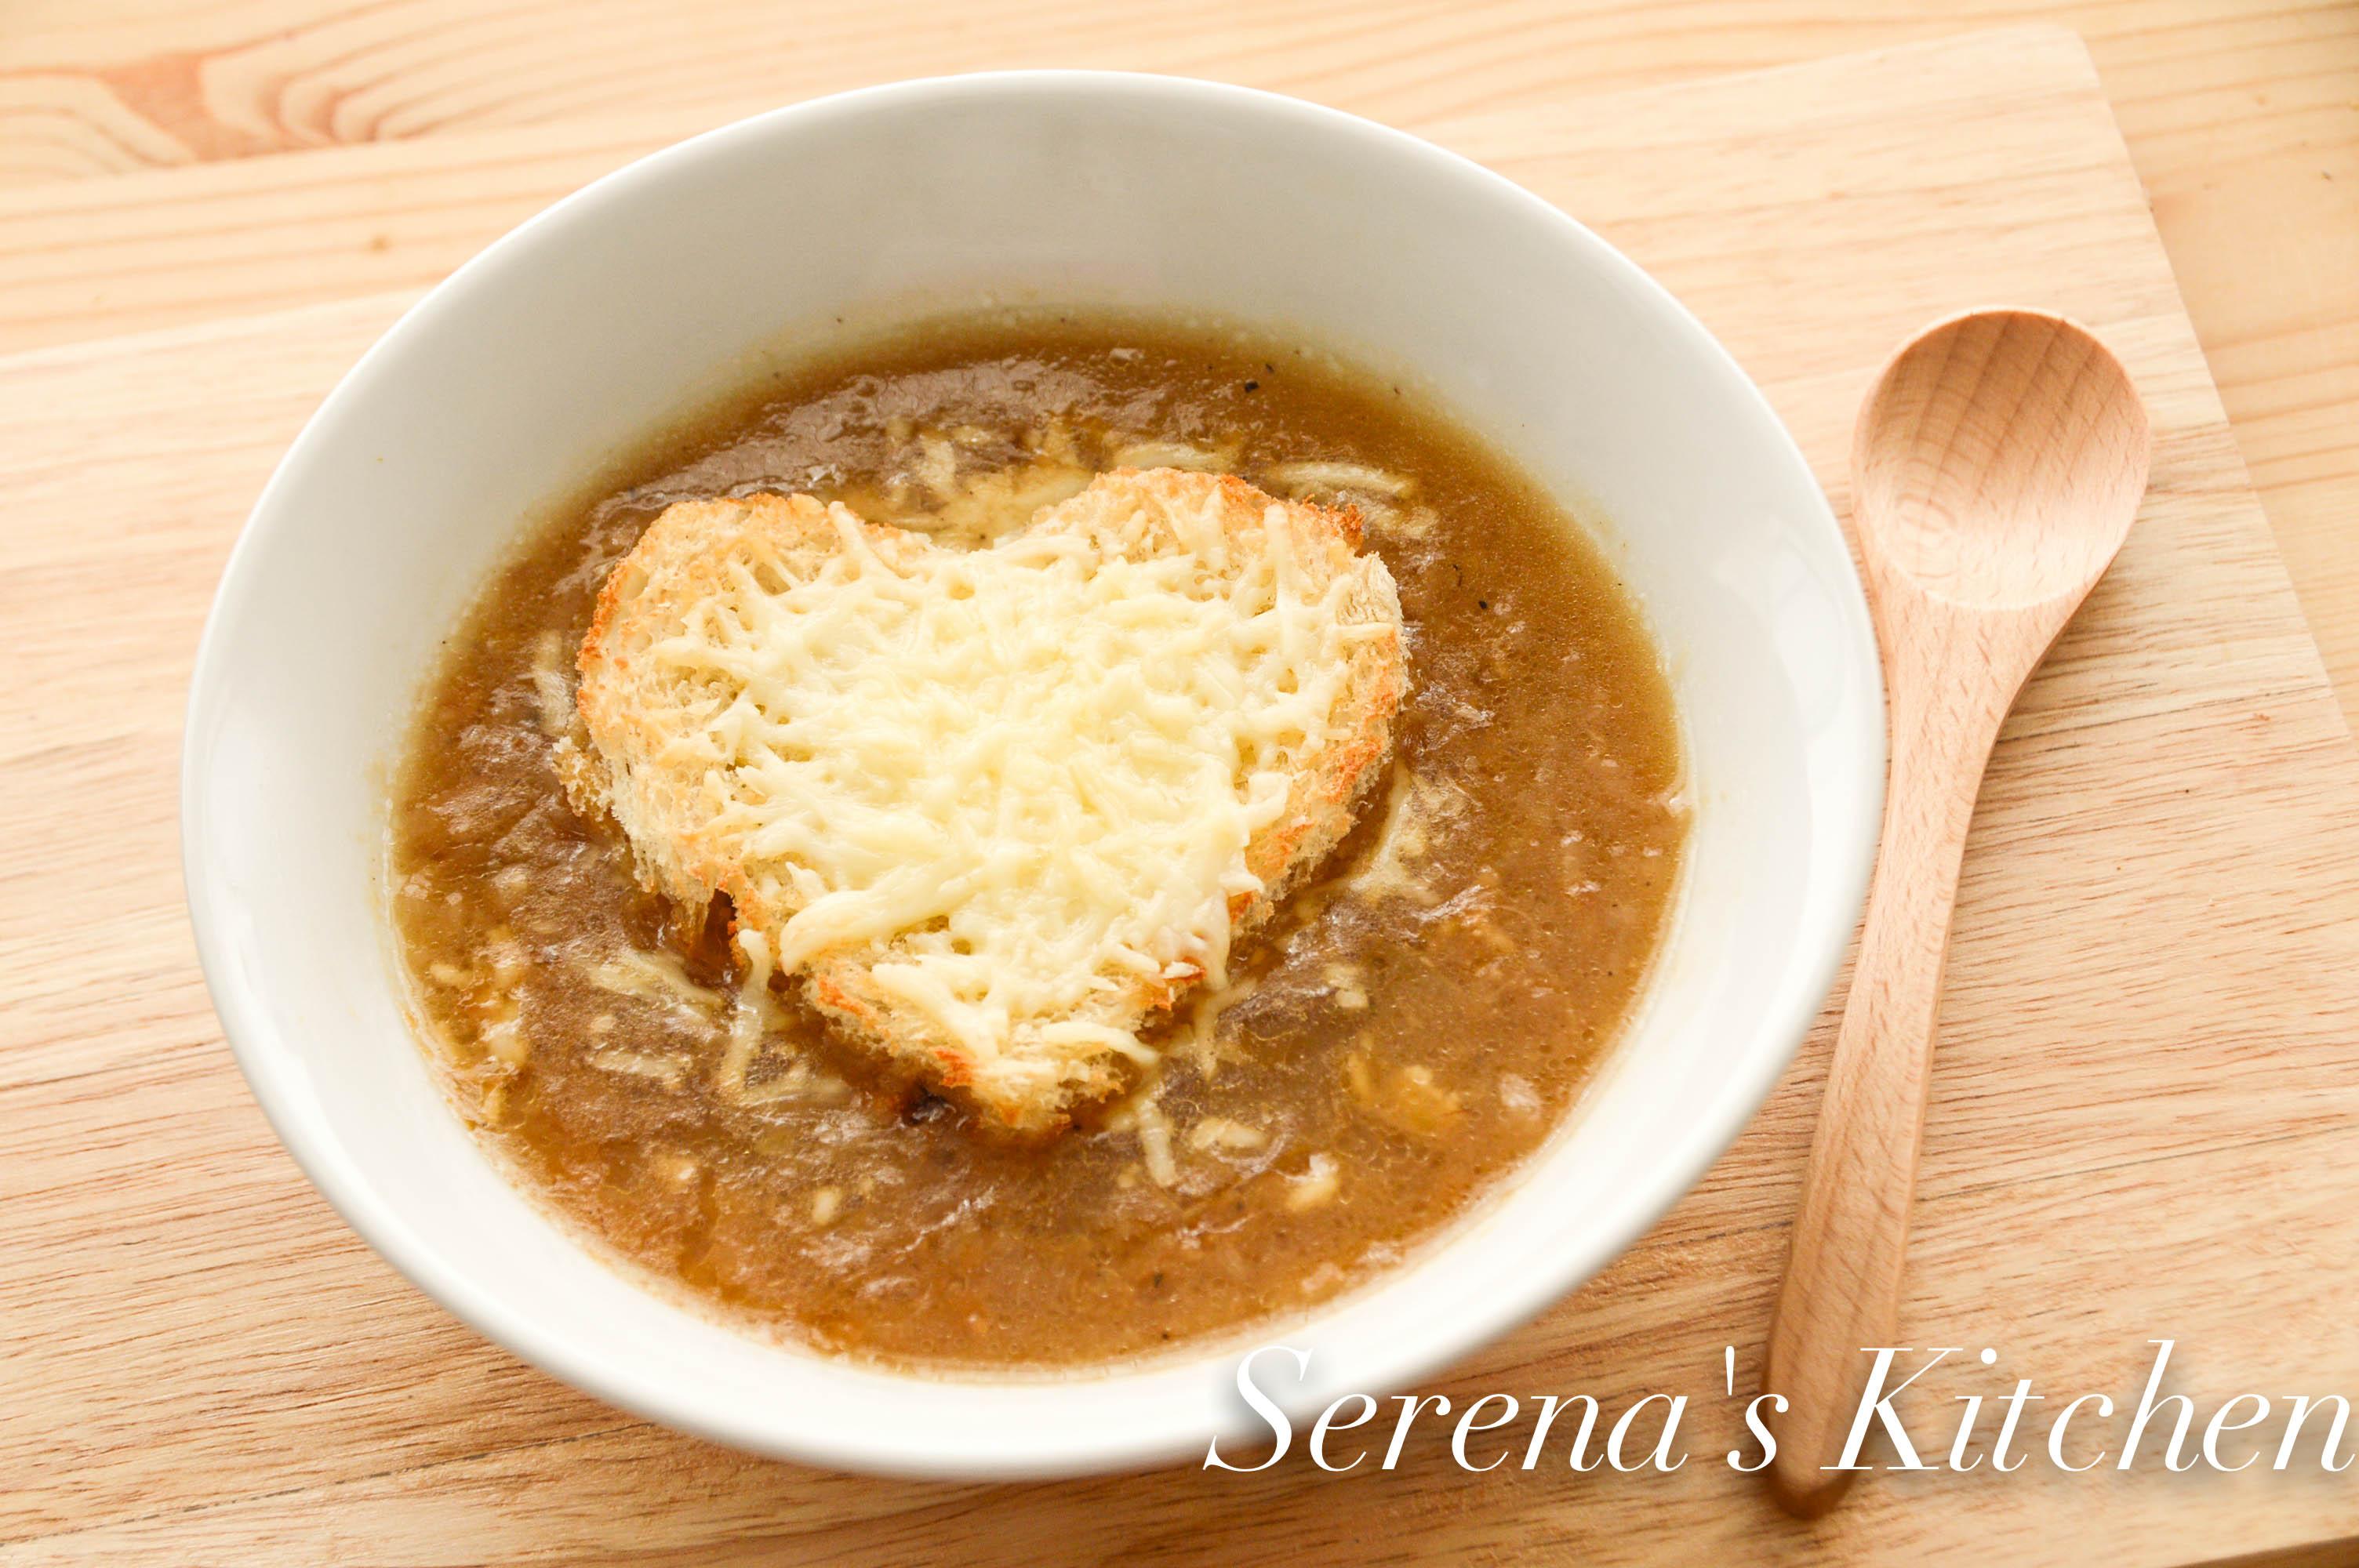 [Serena上菜] 愛心洋蔥湯